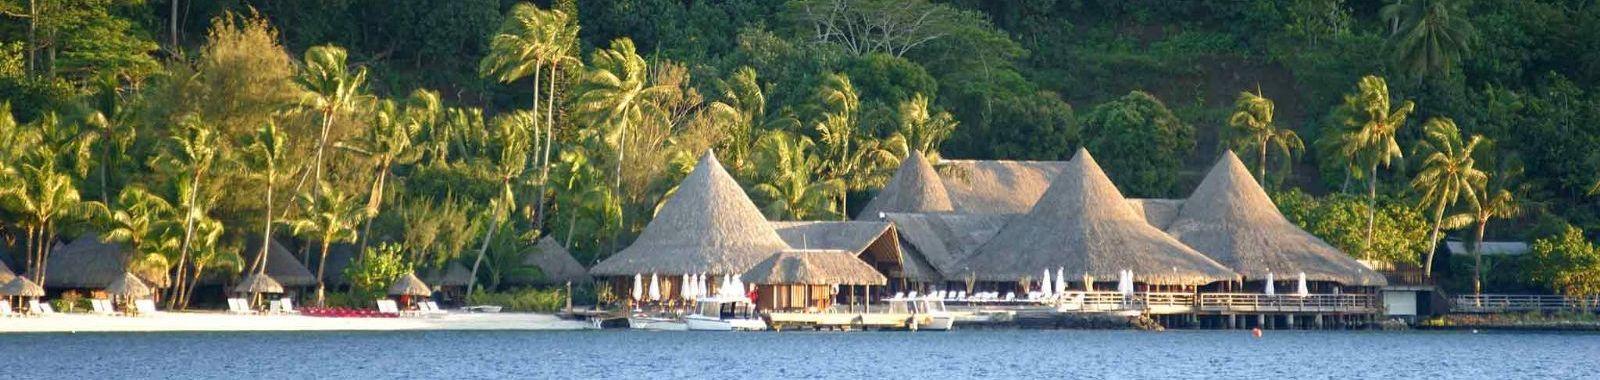 Sofitel Bora Bora Marara Beach & Resort